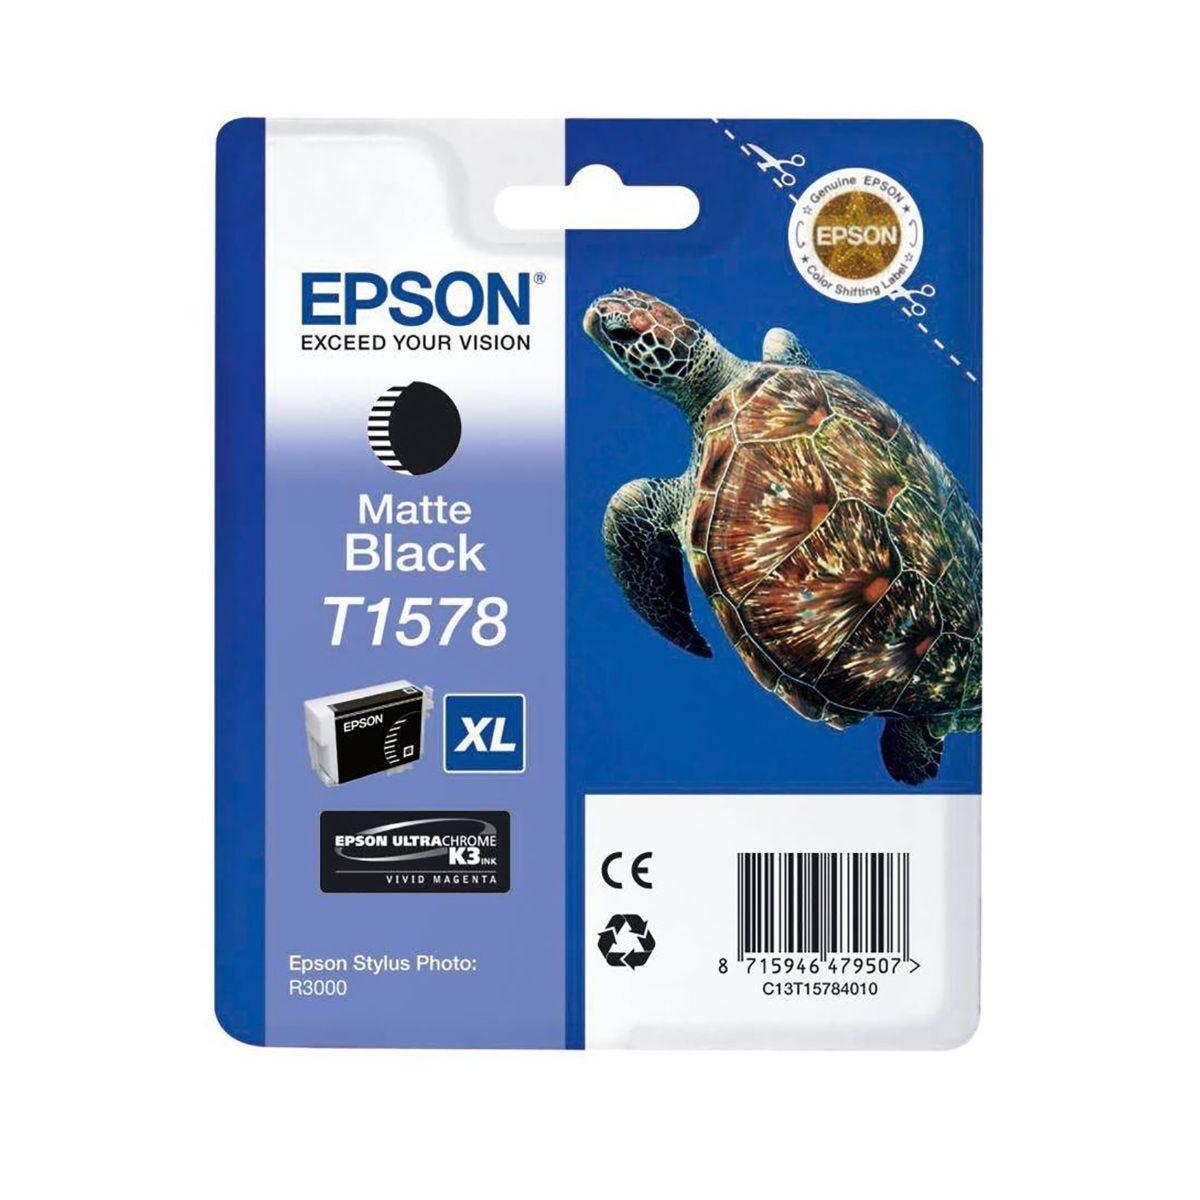 Epson R3000 Matte Black Ink Cartridge